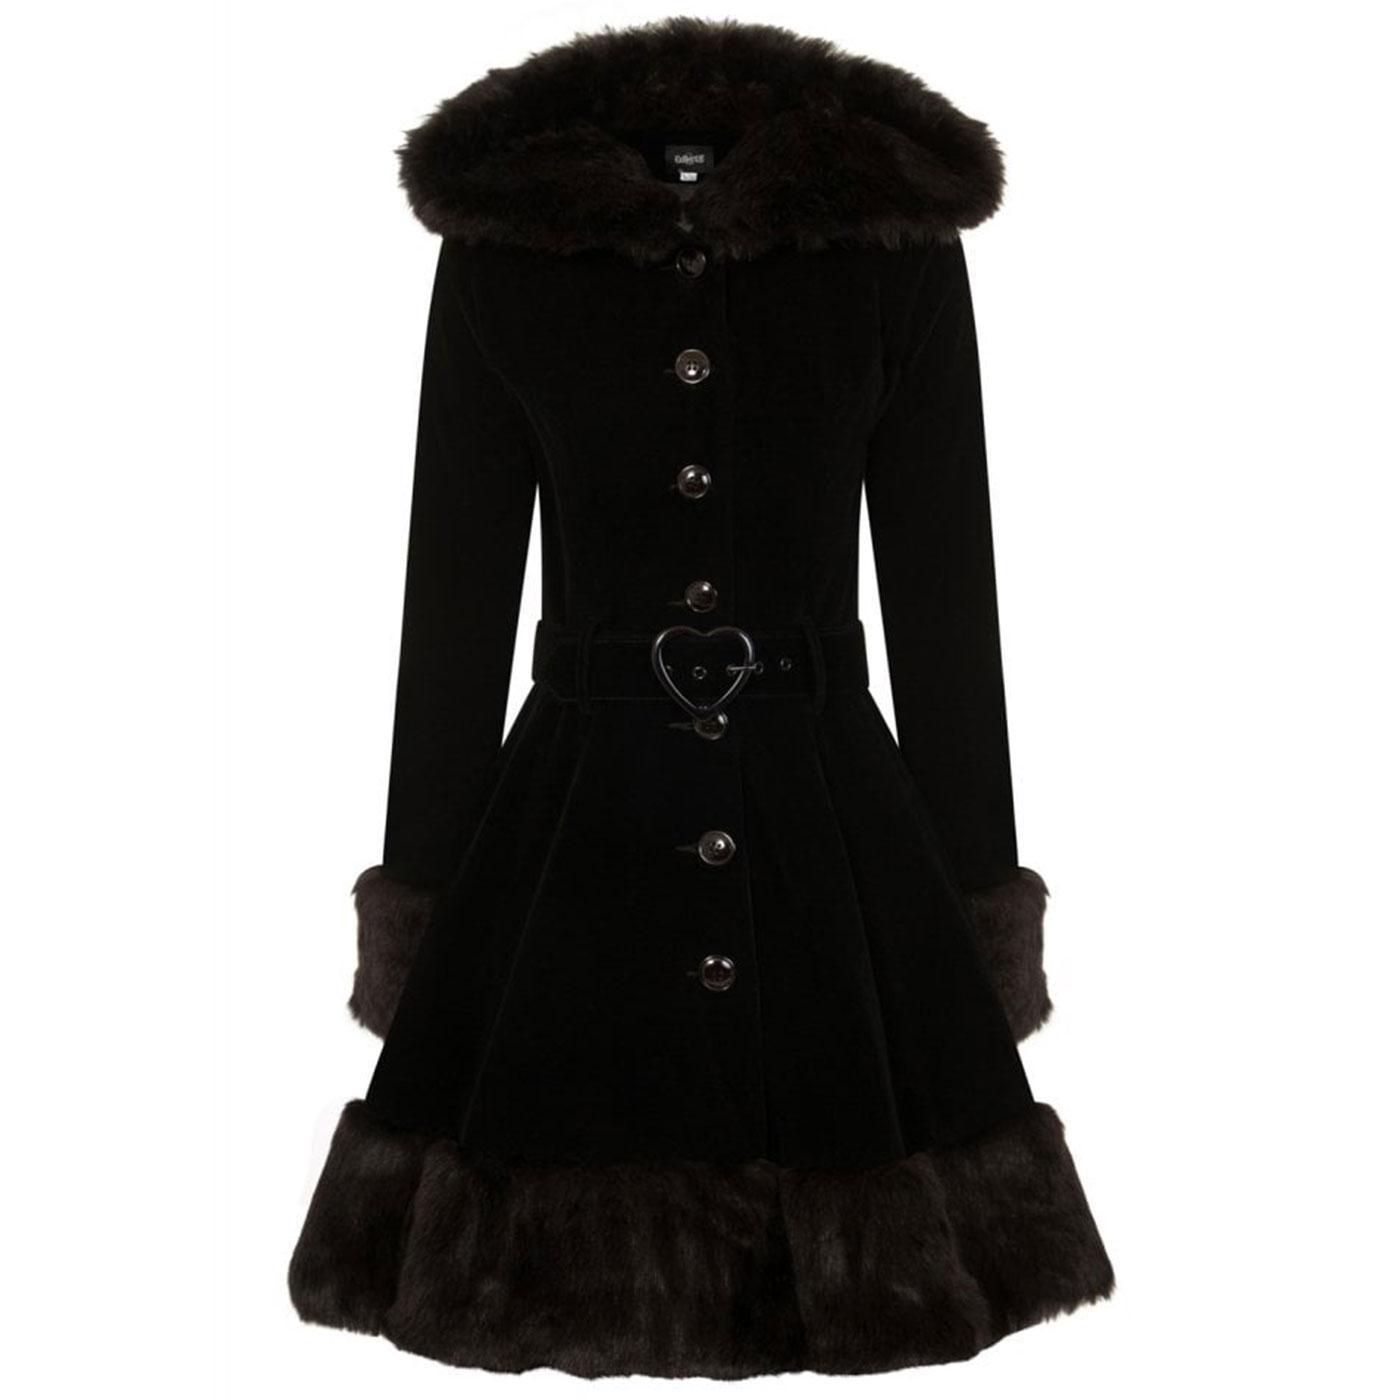 Laila COLLECTIF Retro Hooded Short Velvet Coat